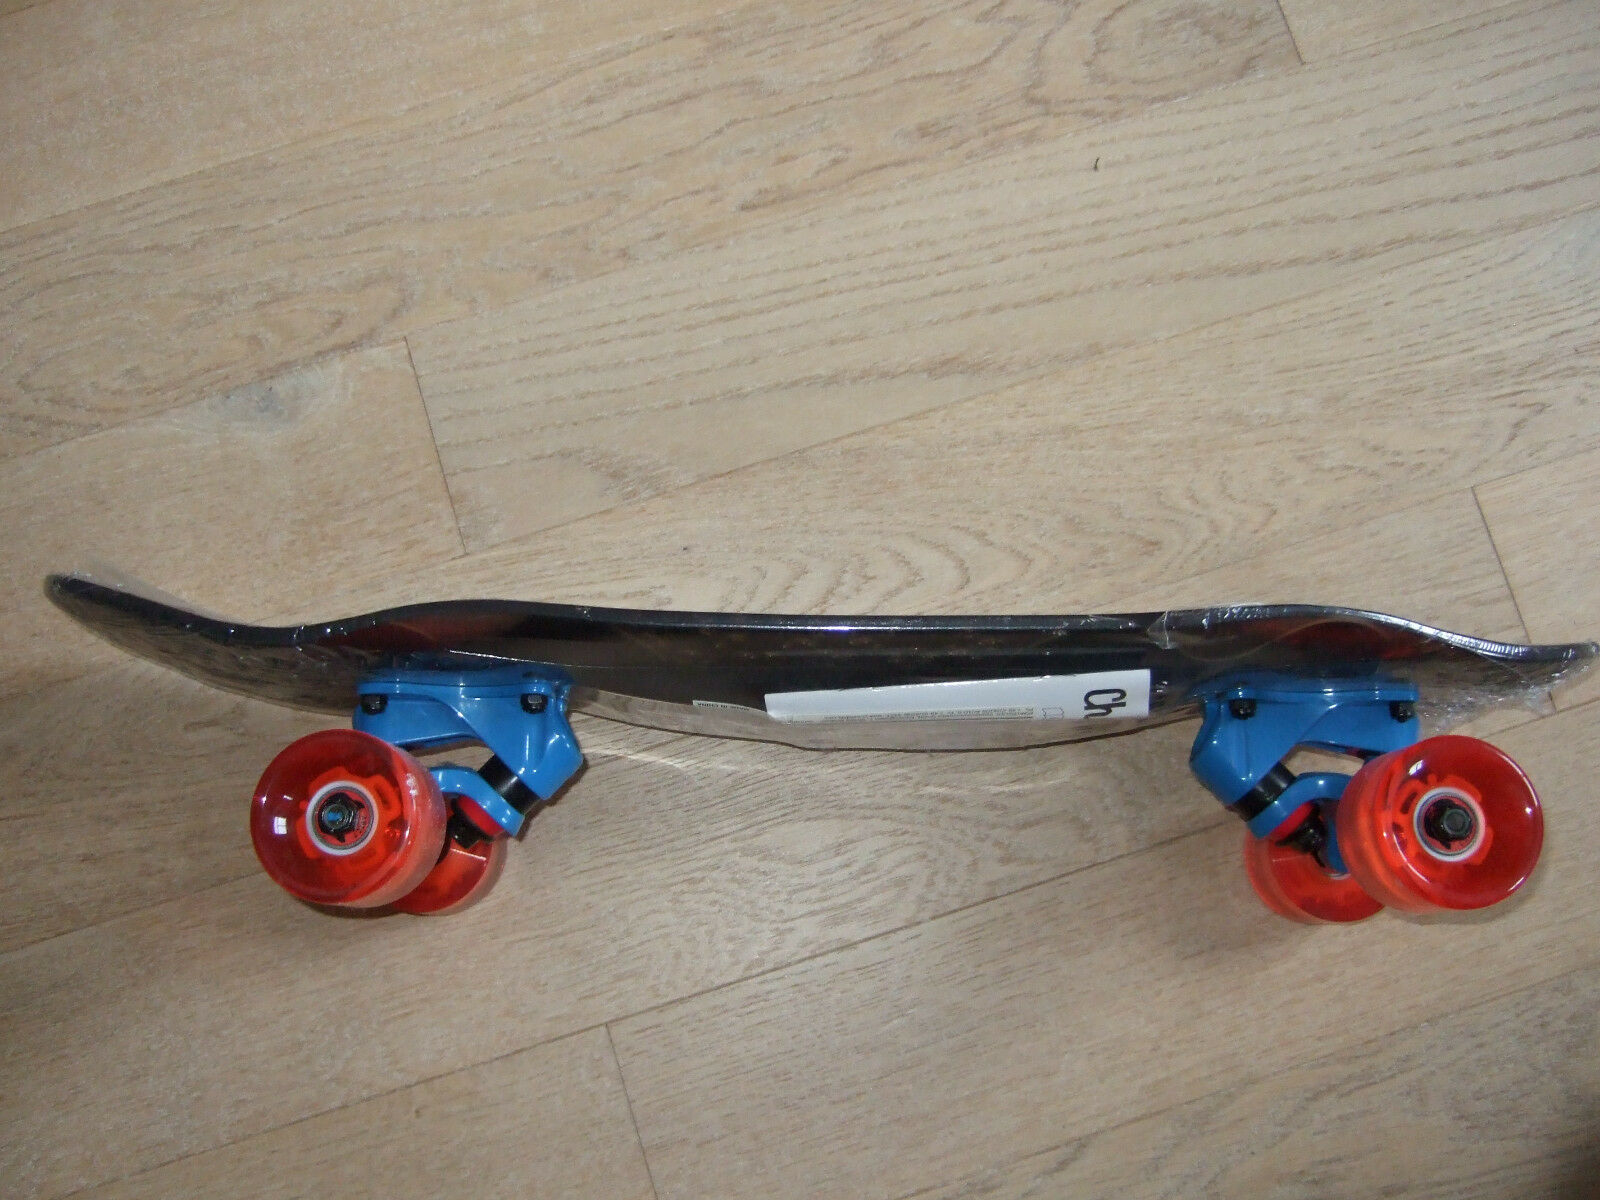 Choke Supercruiser Schwarz/Rot/Blau Plus Spicy Sabrina Elite Skateboard LED Schwarz/Rot/Blau Supercruiser Neu 35ab05